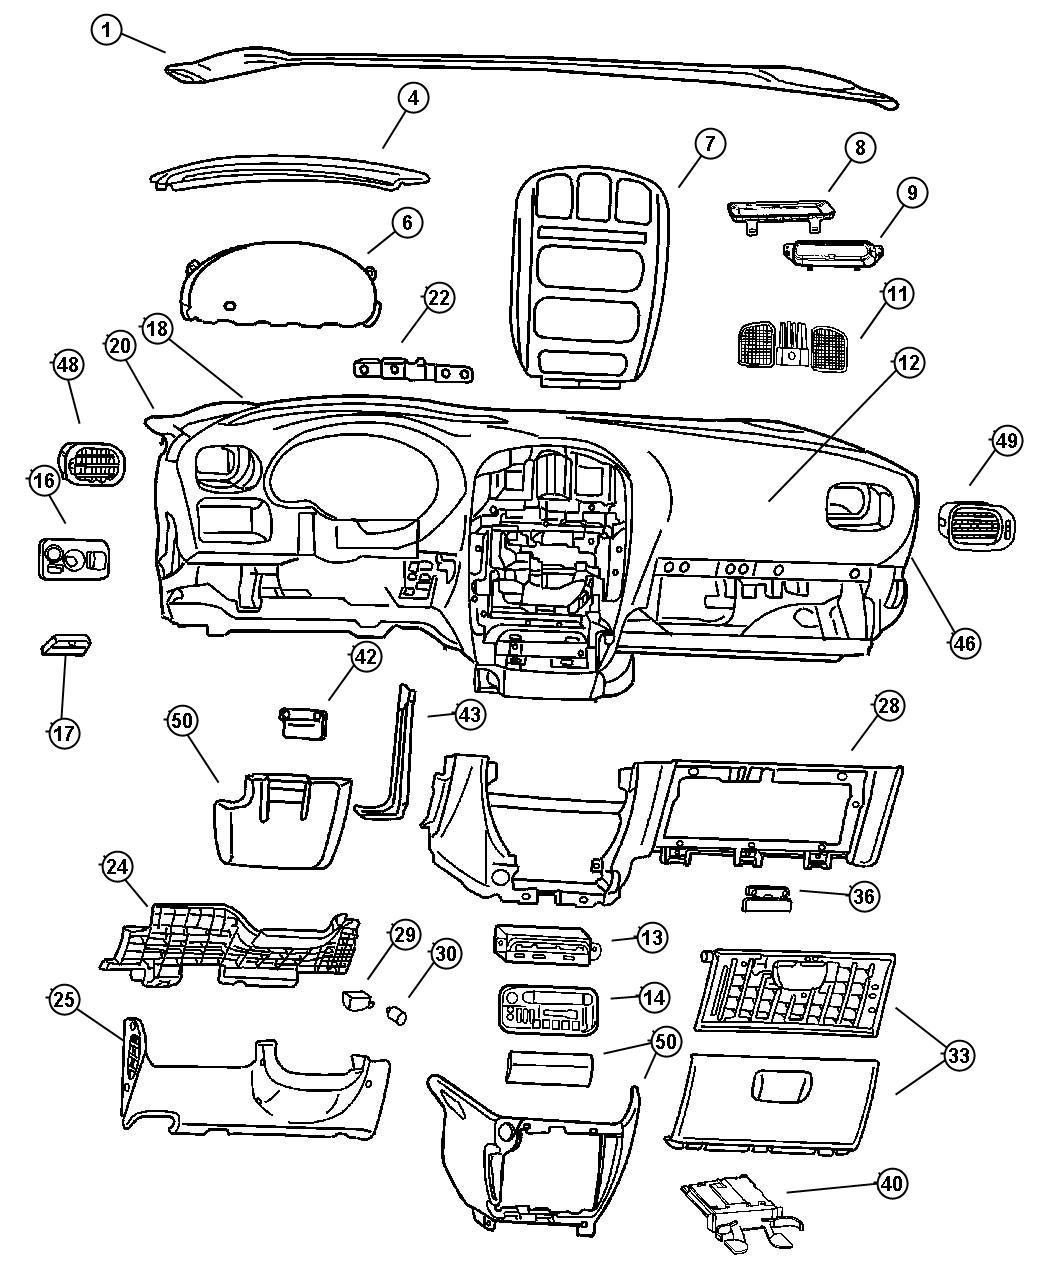 Dodge Grand Caravan Module  Message Center   Ql   Trim    O0  Color   -ql